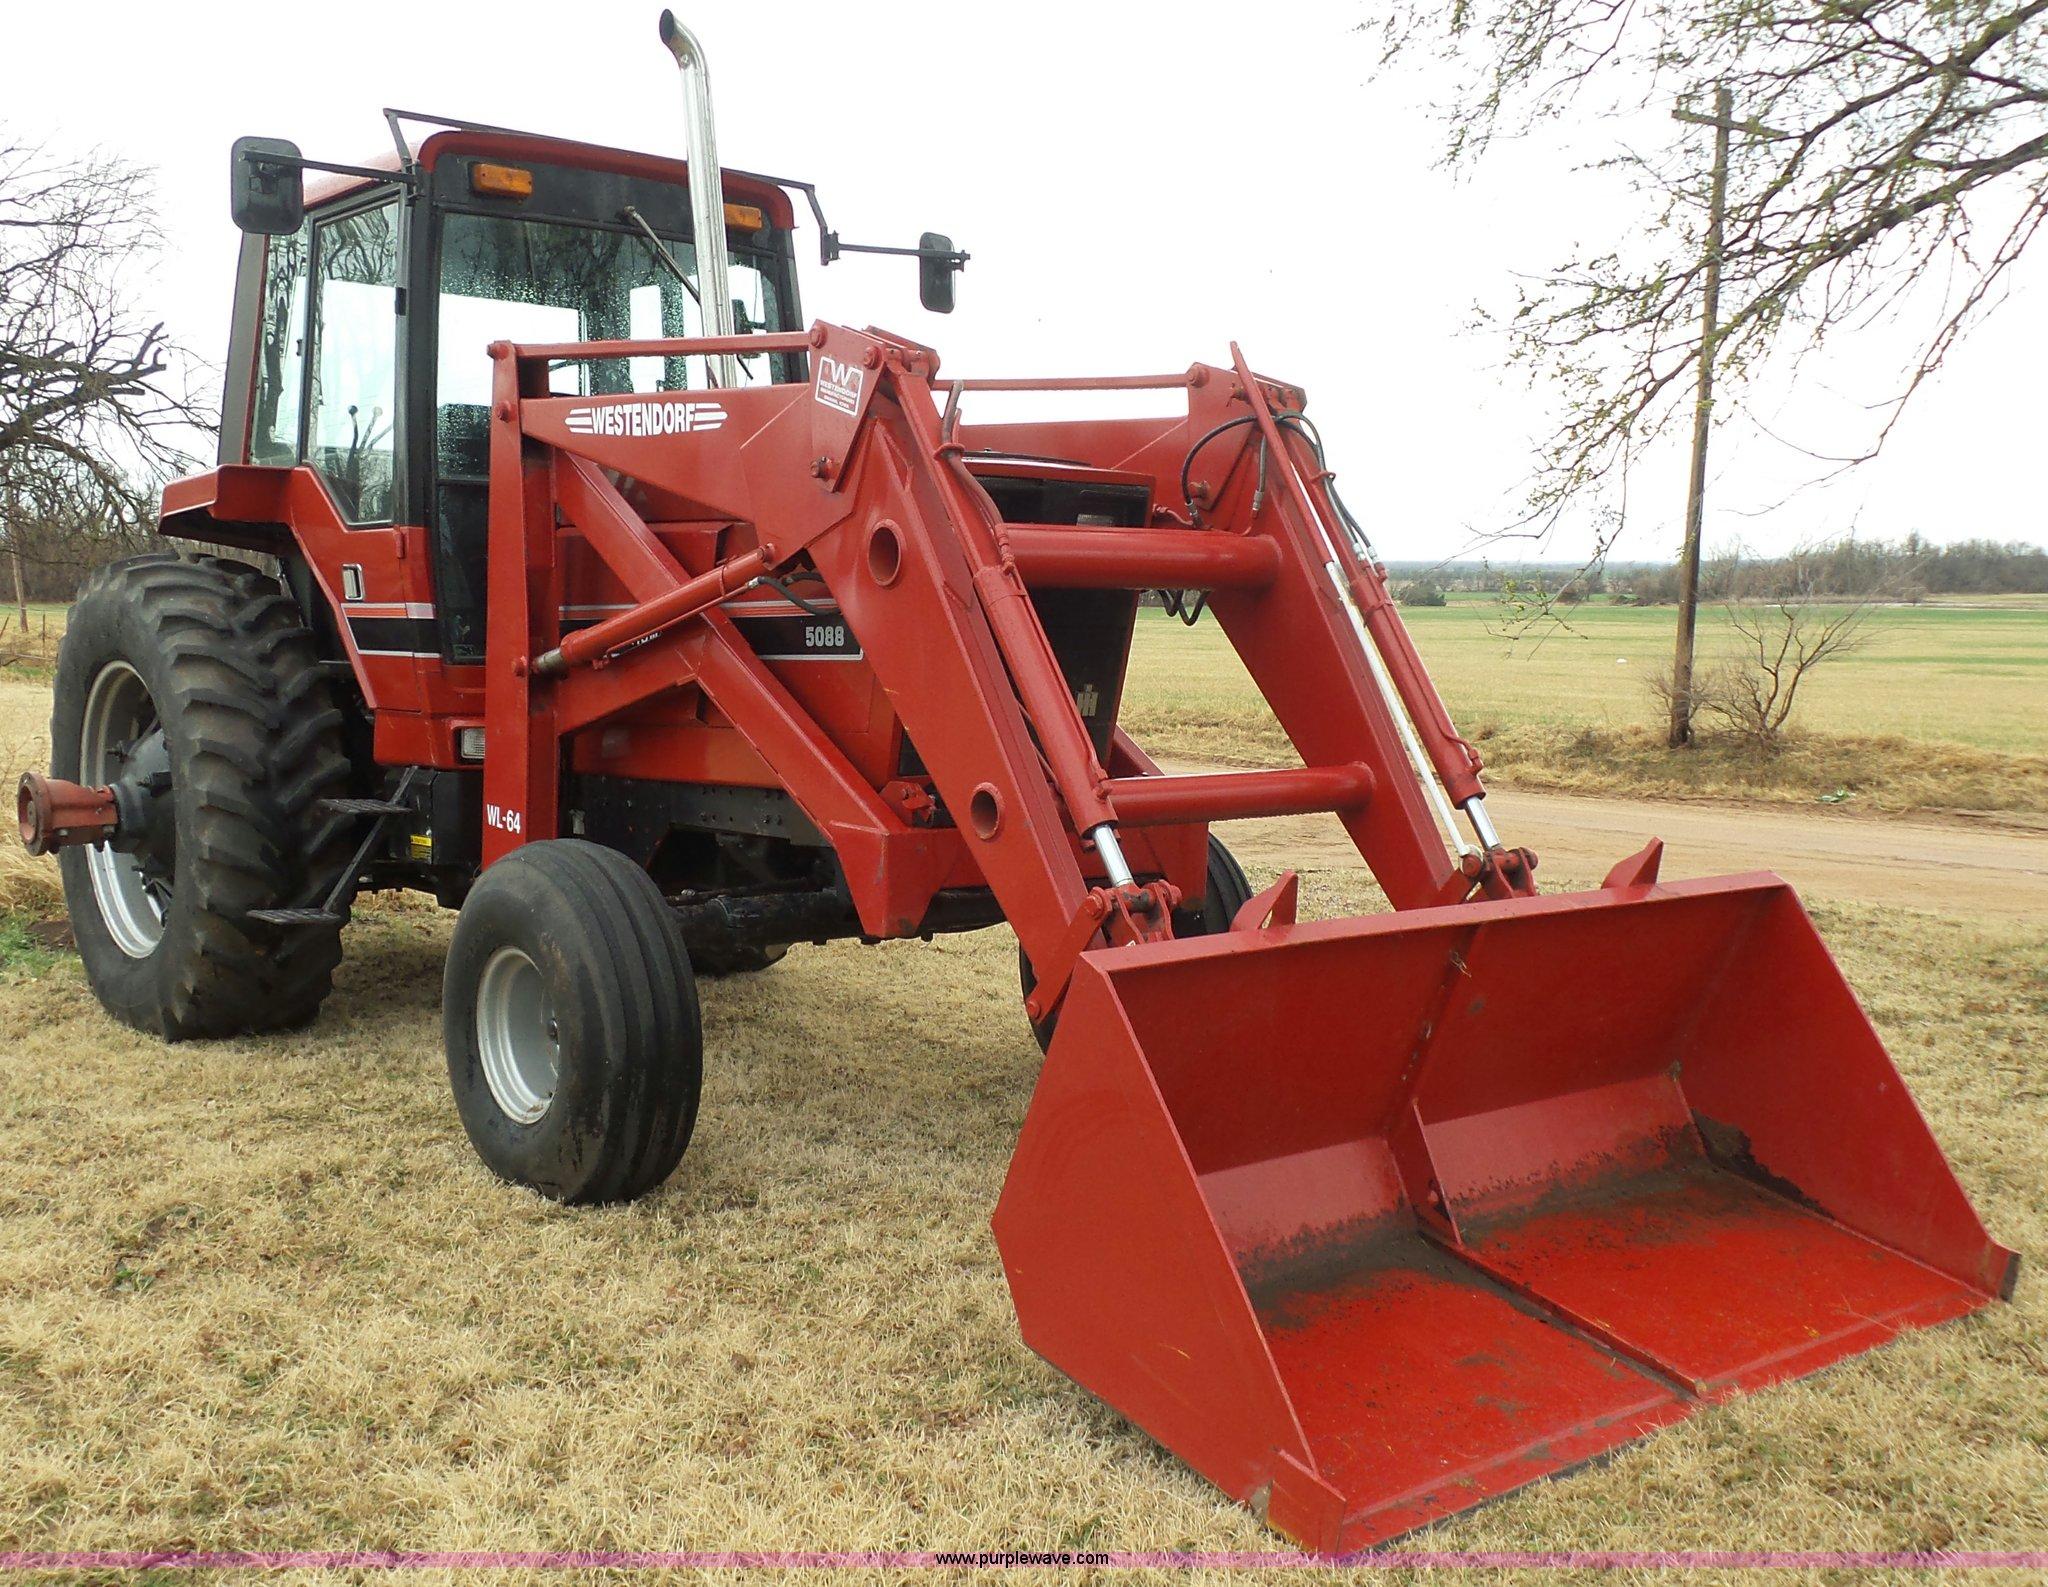 1982 international 5088 tractor item l7300 sold april 1 rh purplewave com